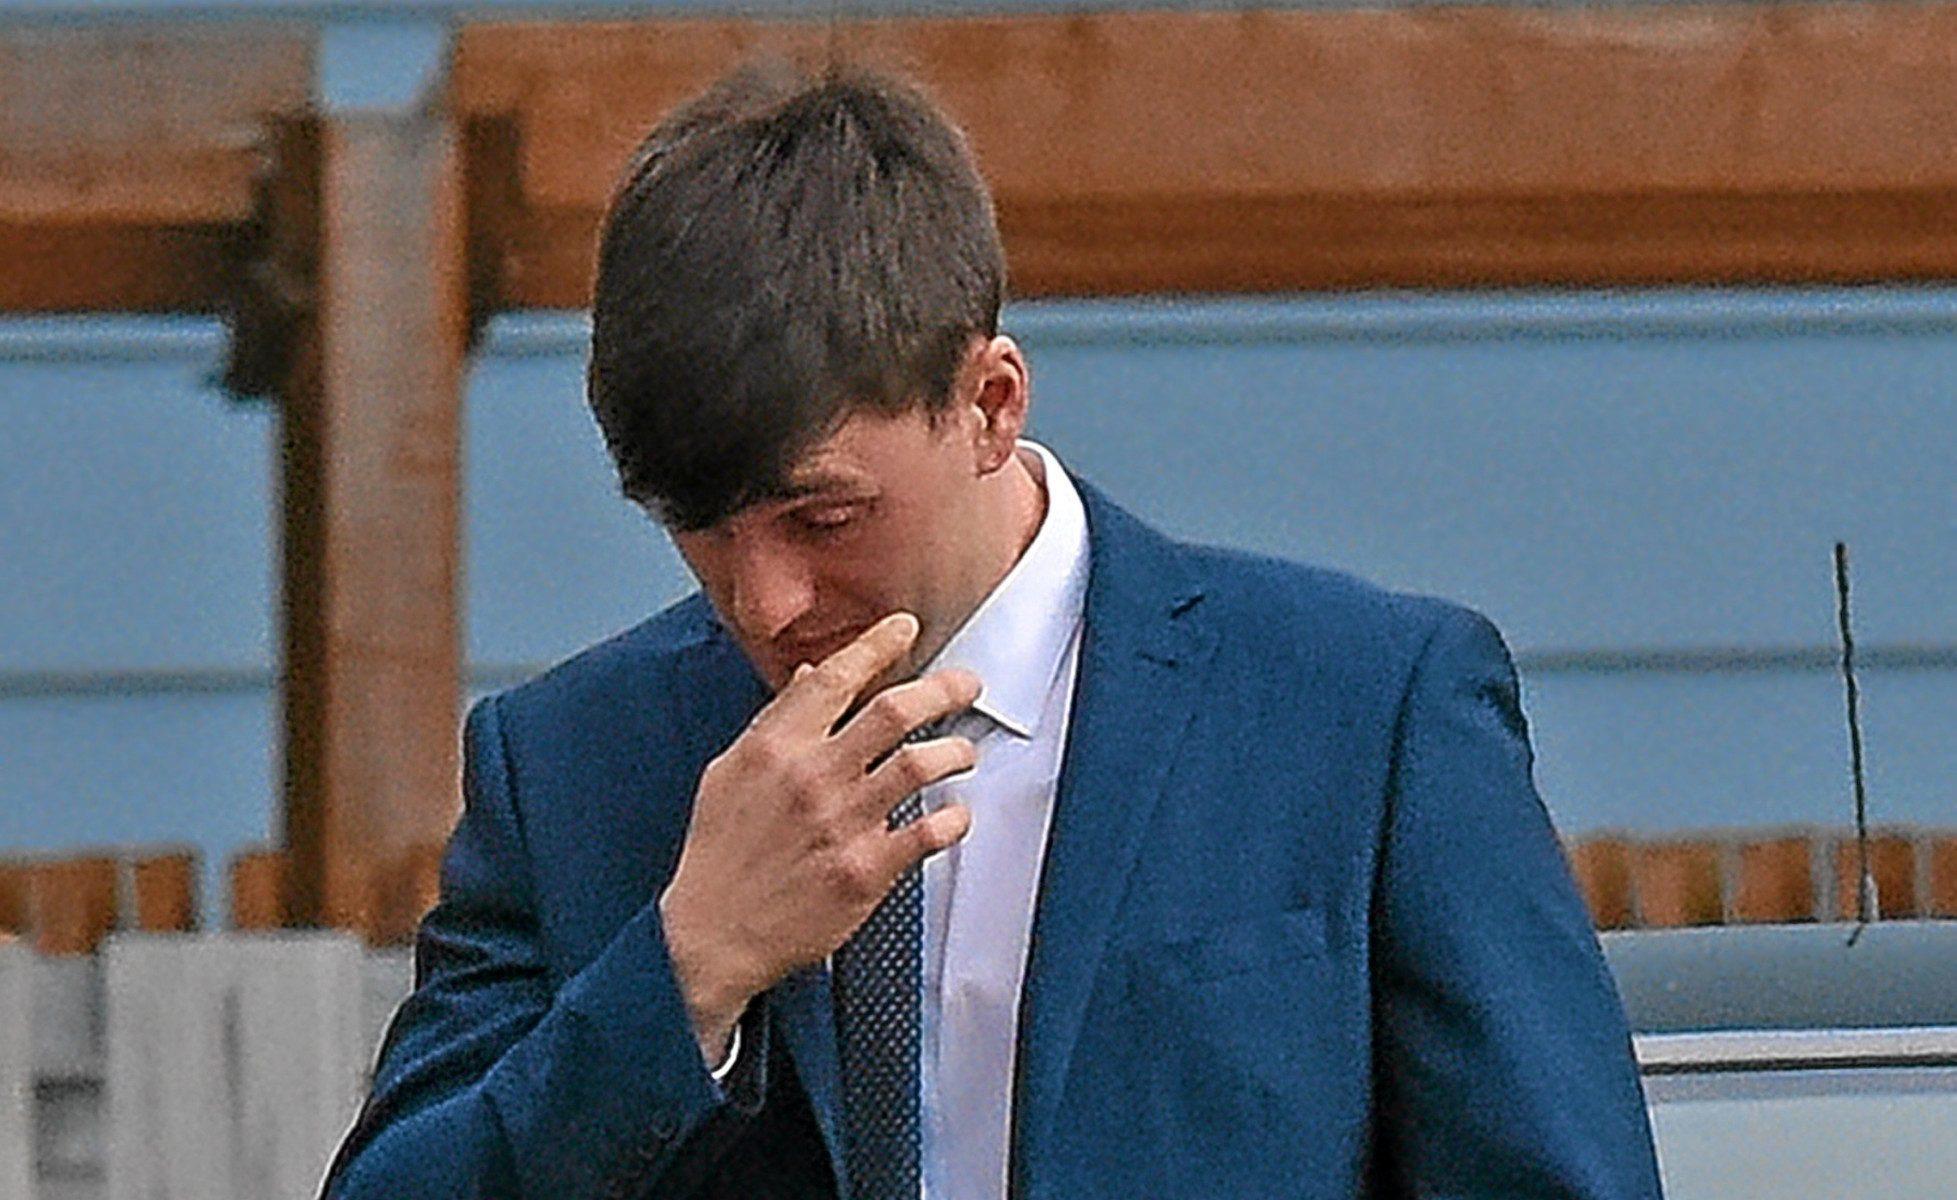 Former Marine Ryan Logan at Portsmouth Court Martial.